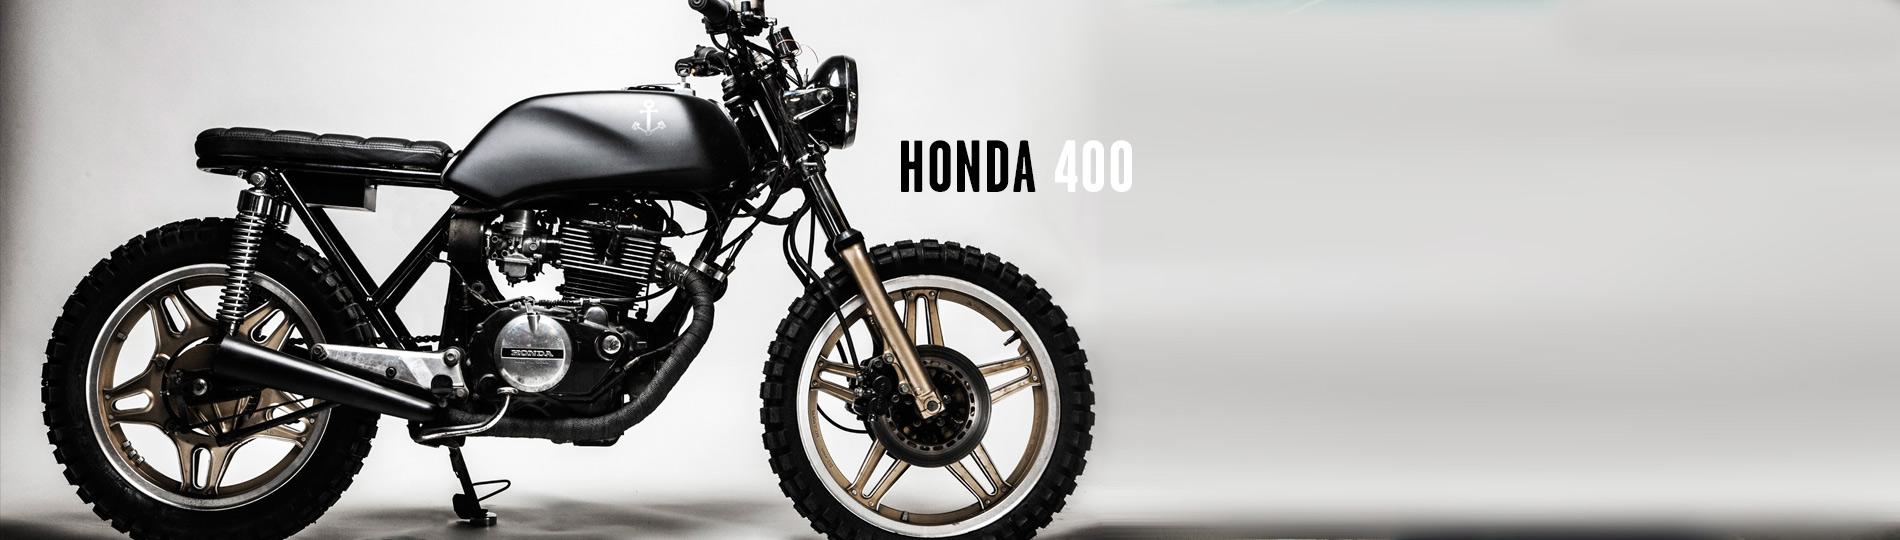 VCS HONDA 400